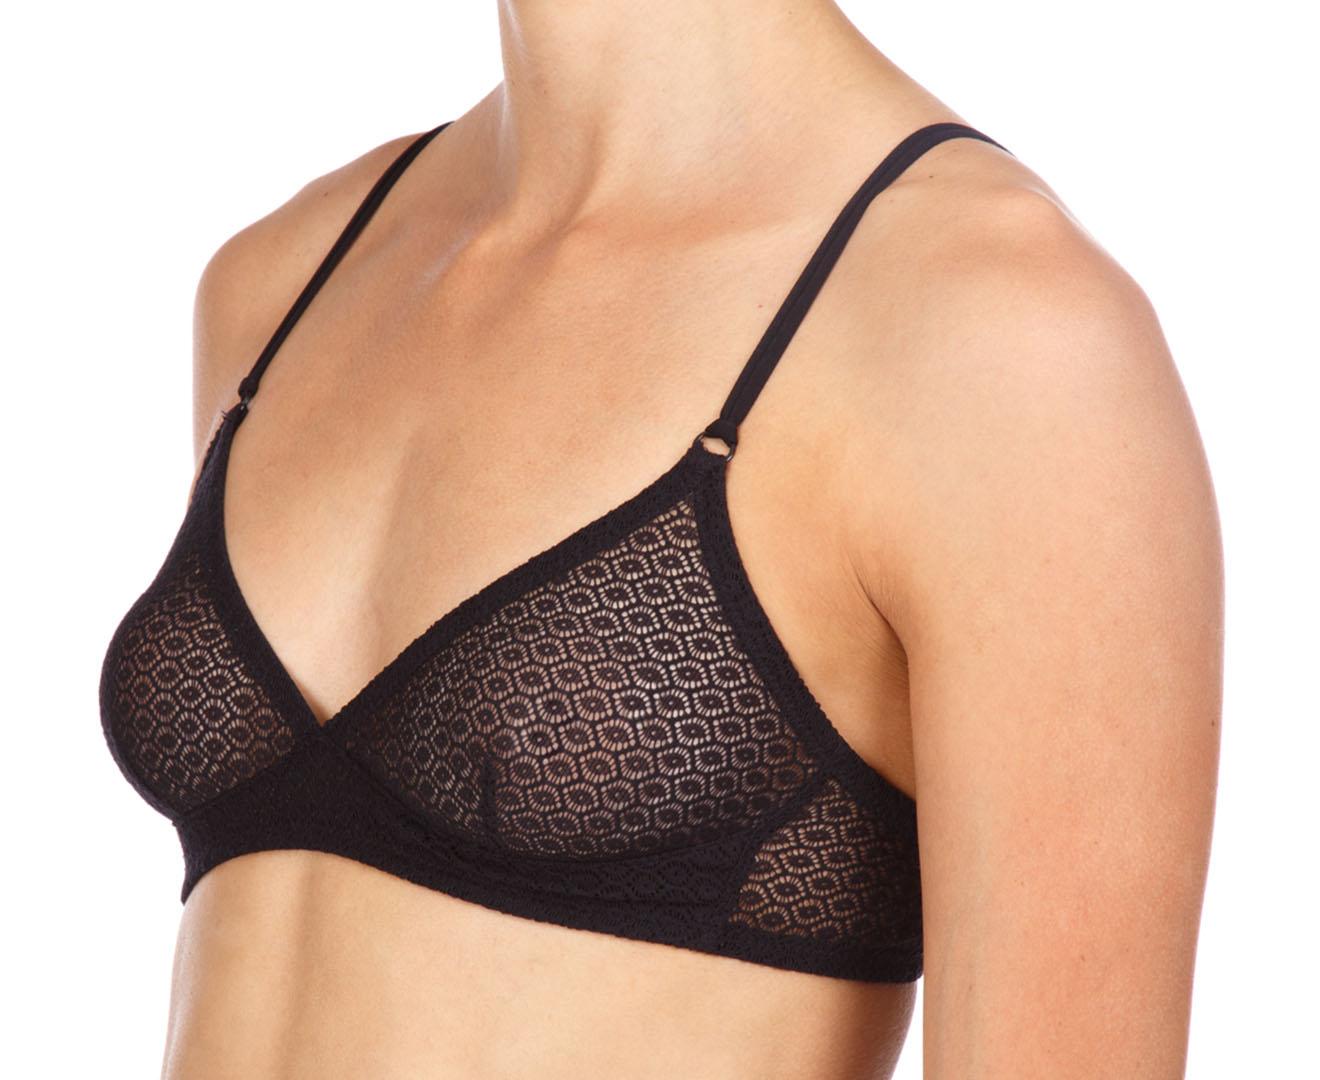 fc32793cad9 American Apparel Women s Lace Geo Bralette - Black